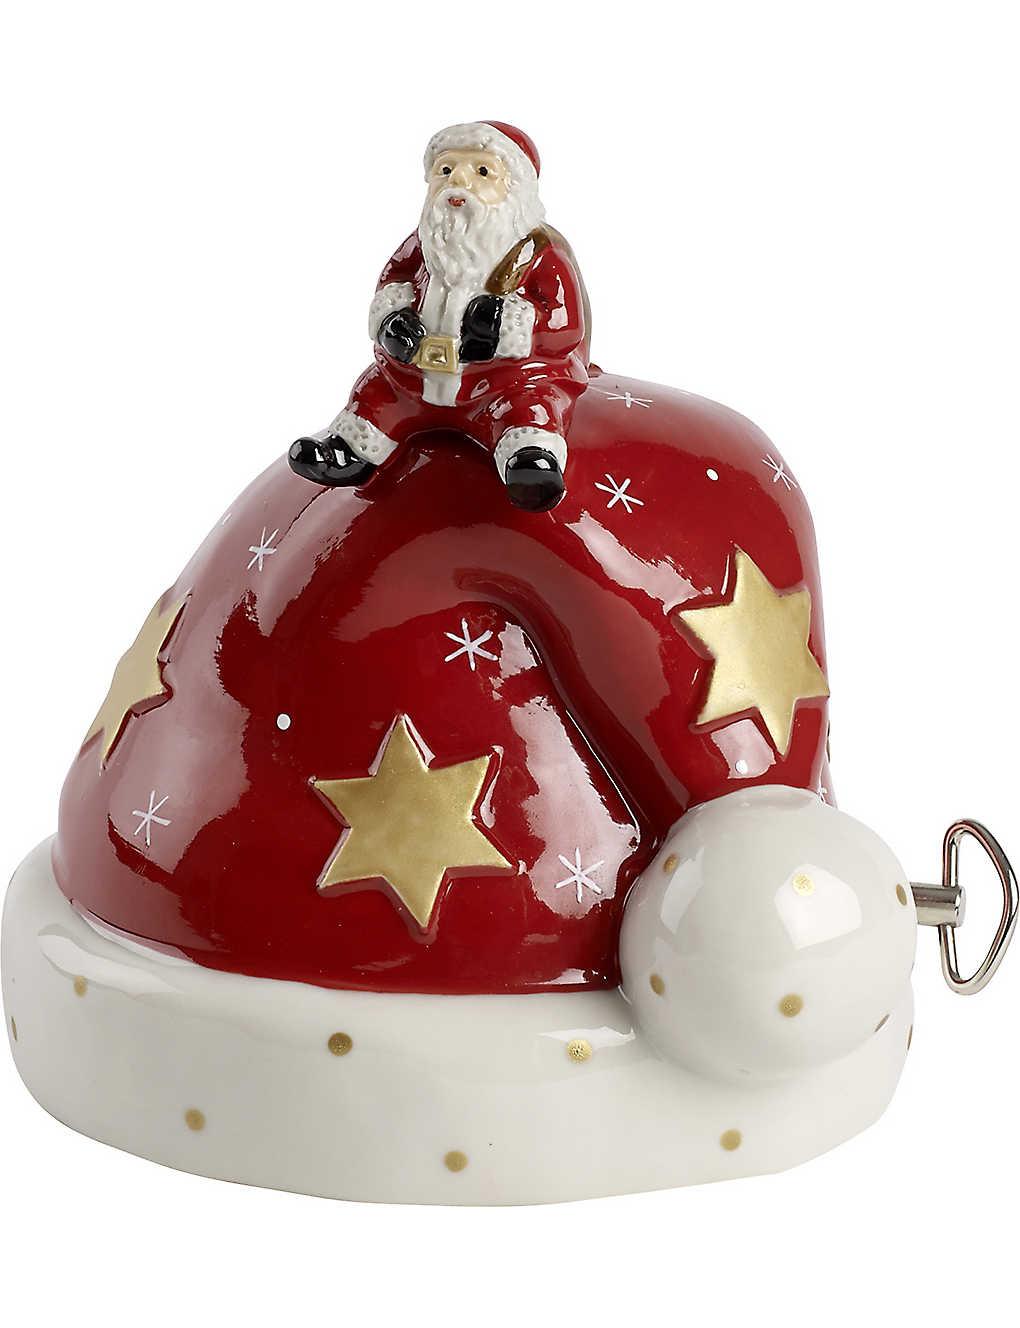 db98b533024d5 VILLEROY   BOCH - Santa hat porcelain musical ornament